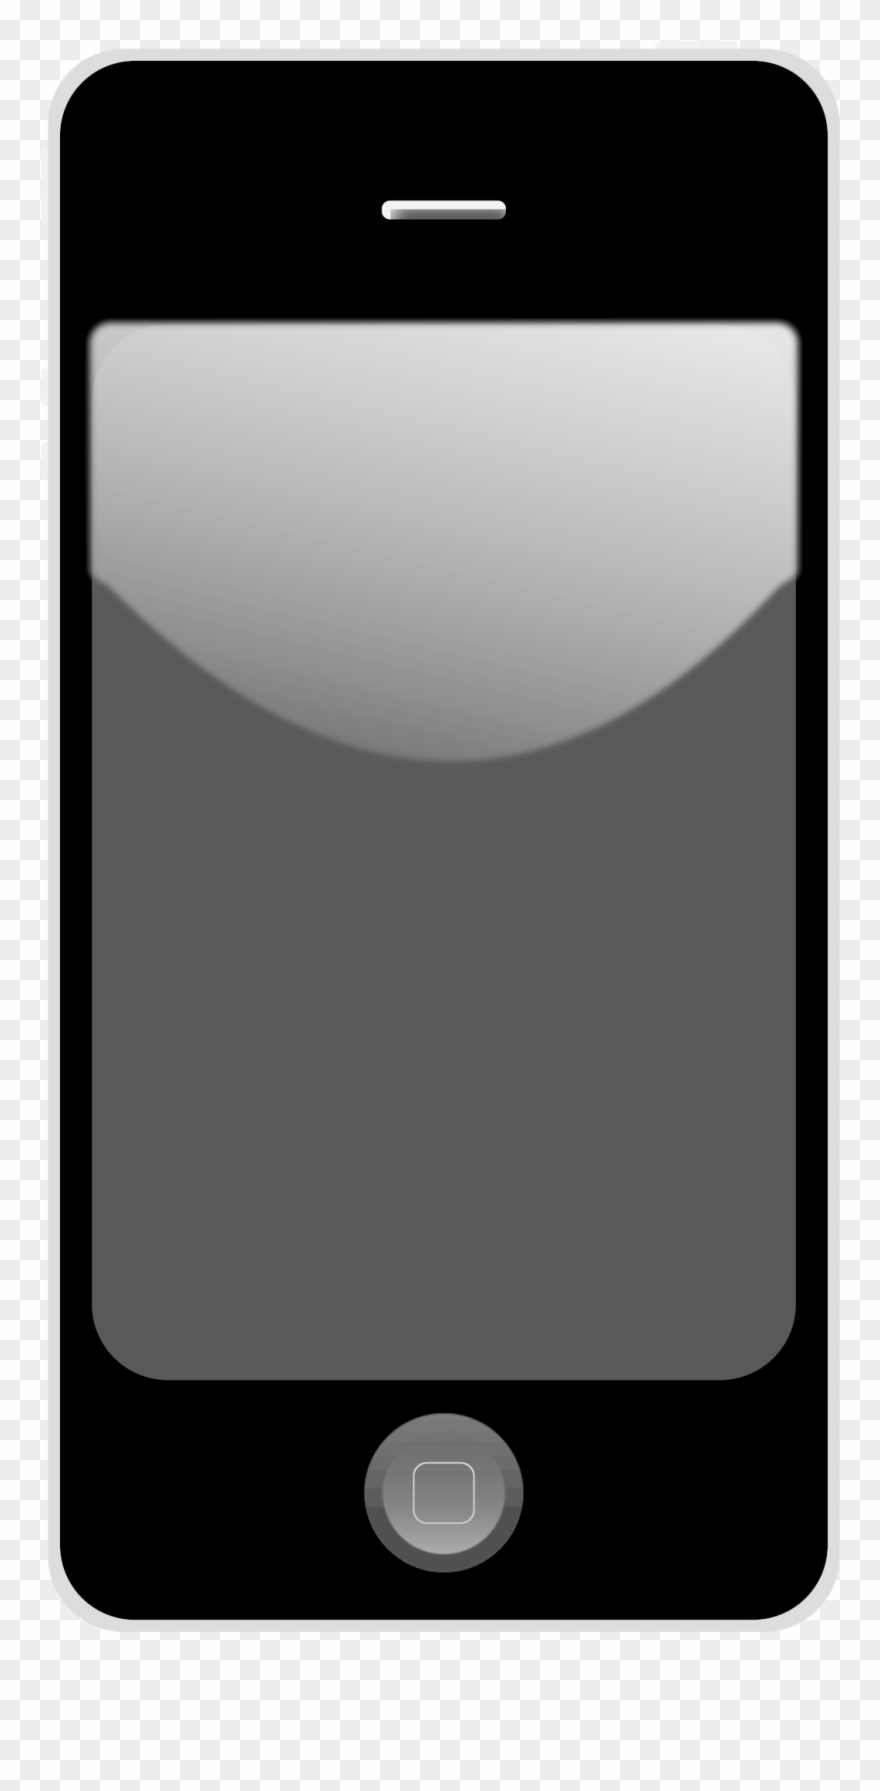 Clipart Iphone 4 Love Clip Art Coral Love Clip Art.